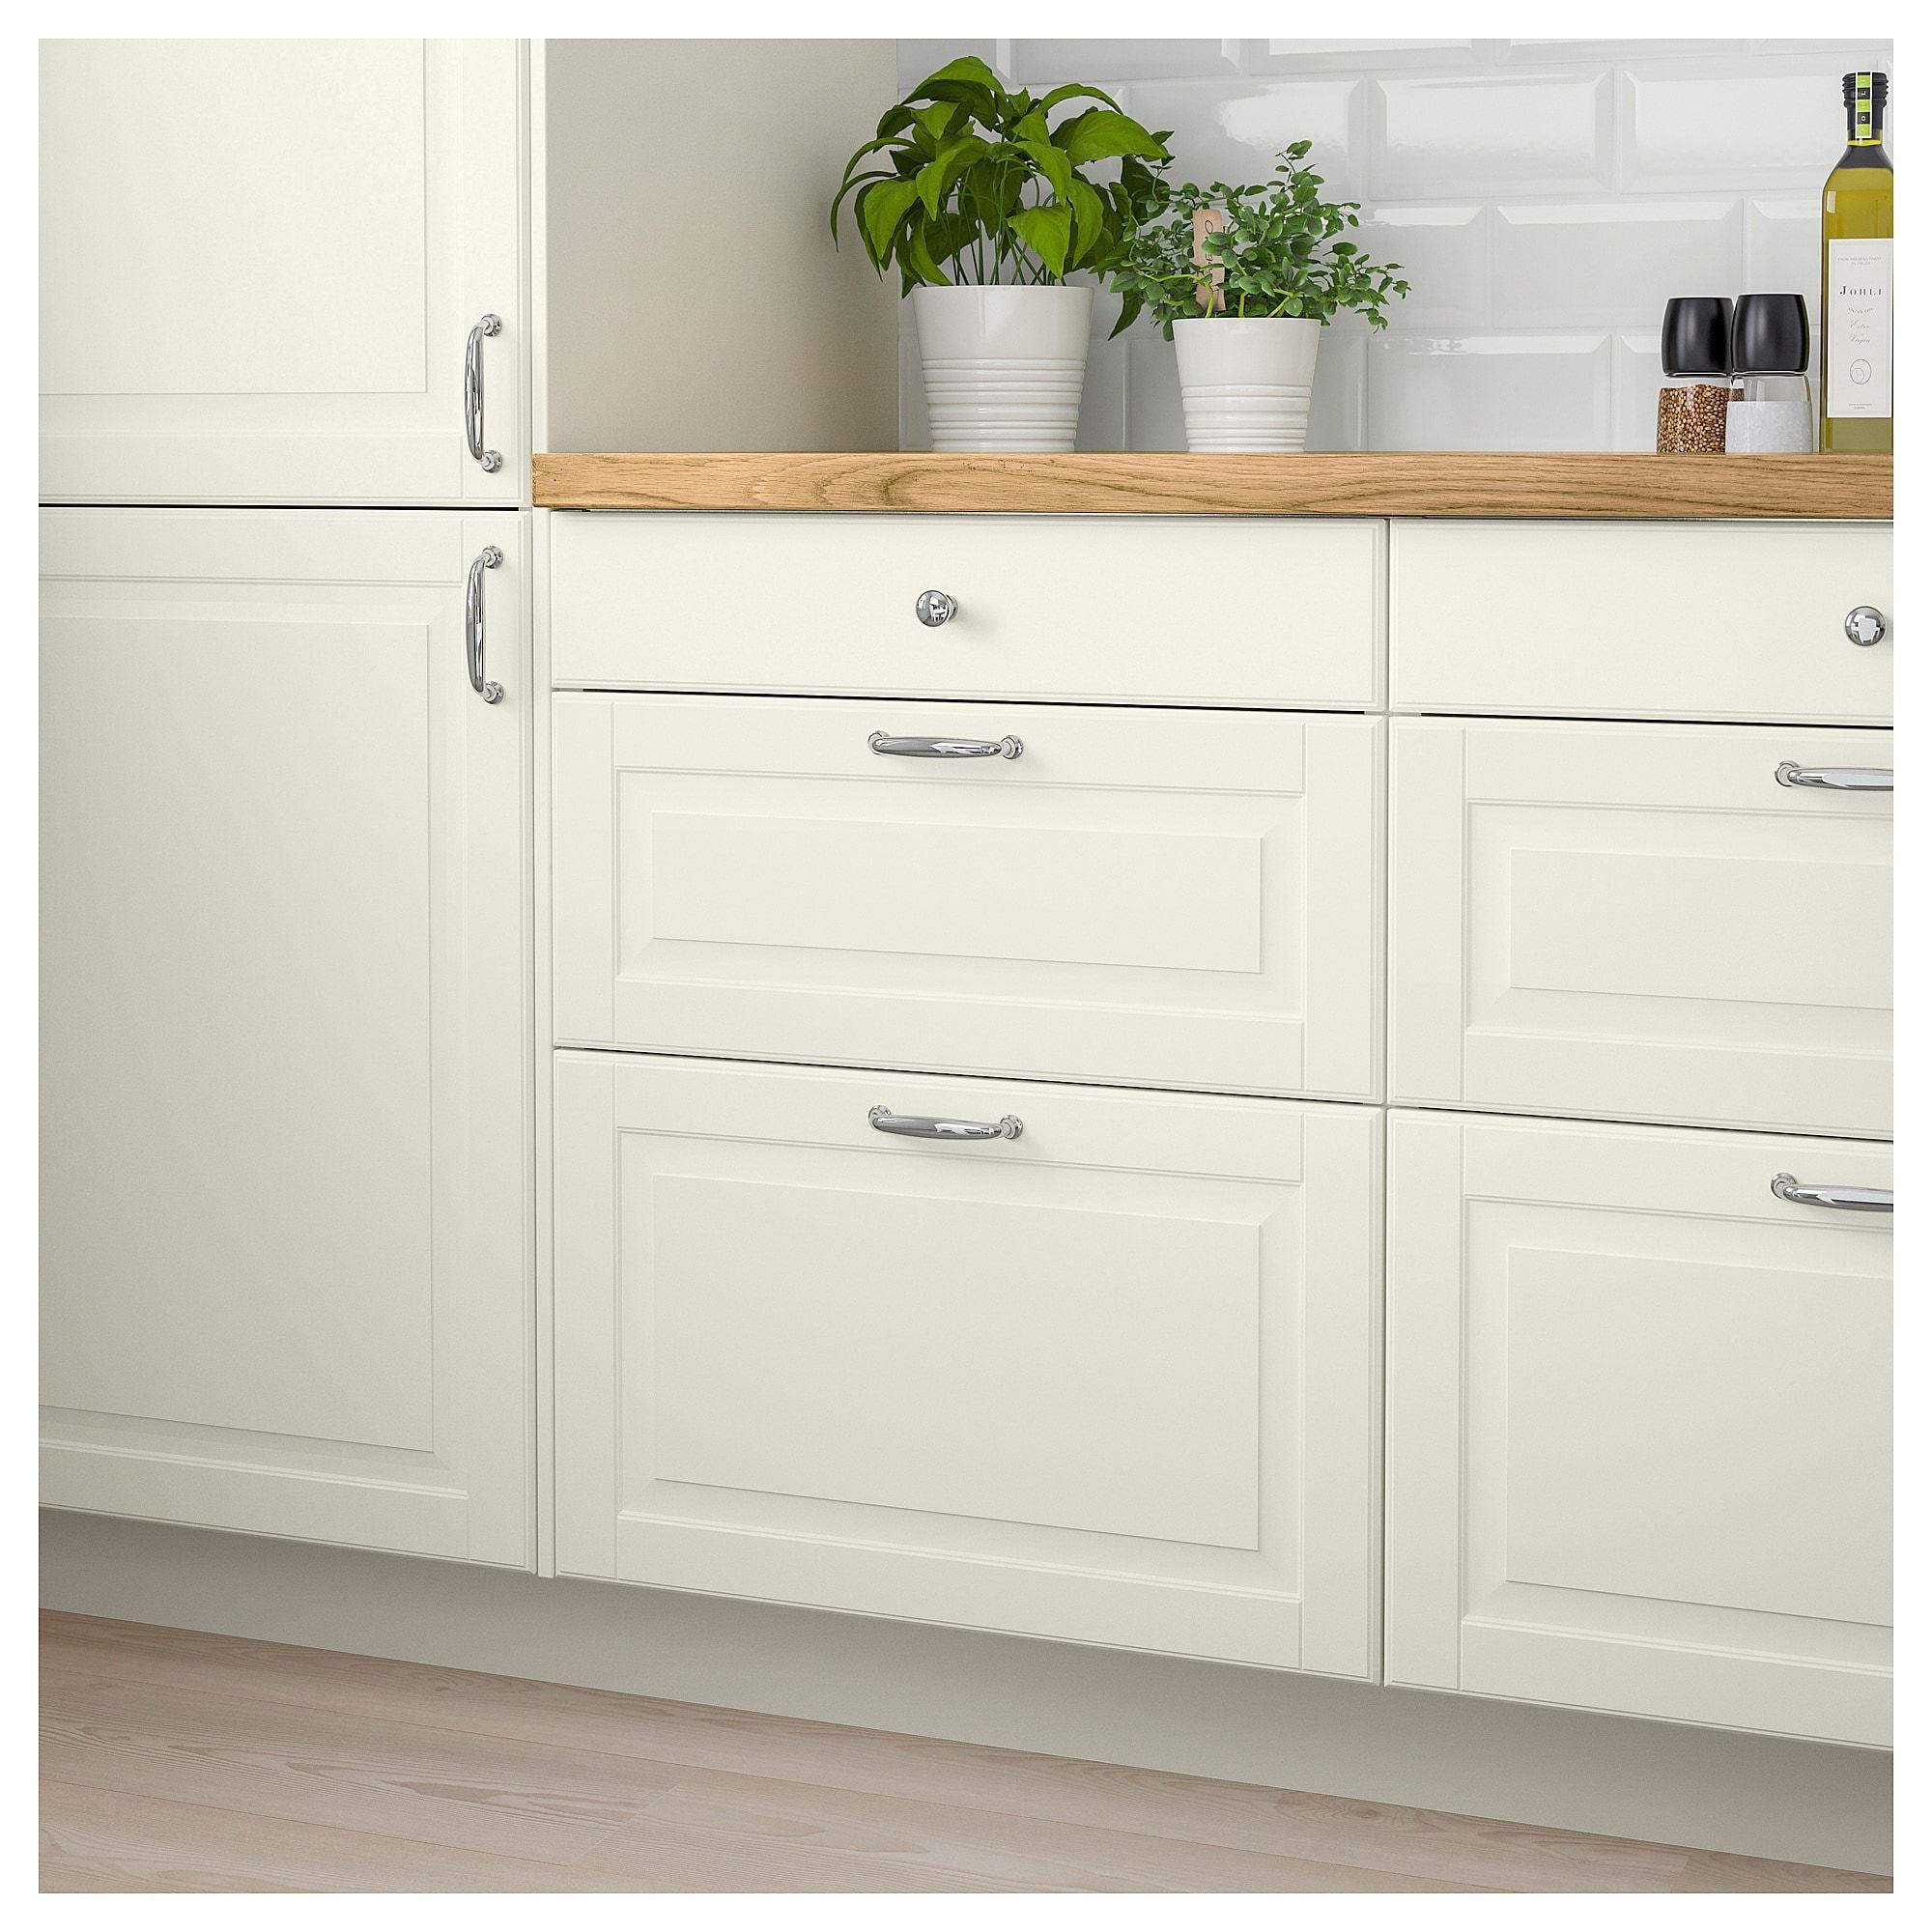 Best Bodbyn Drawer Front Off White 30X10 Kitchen Remodel 400 x 300